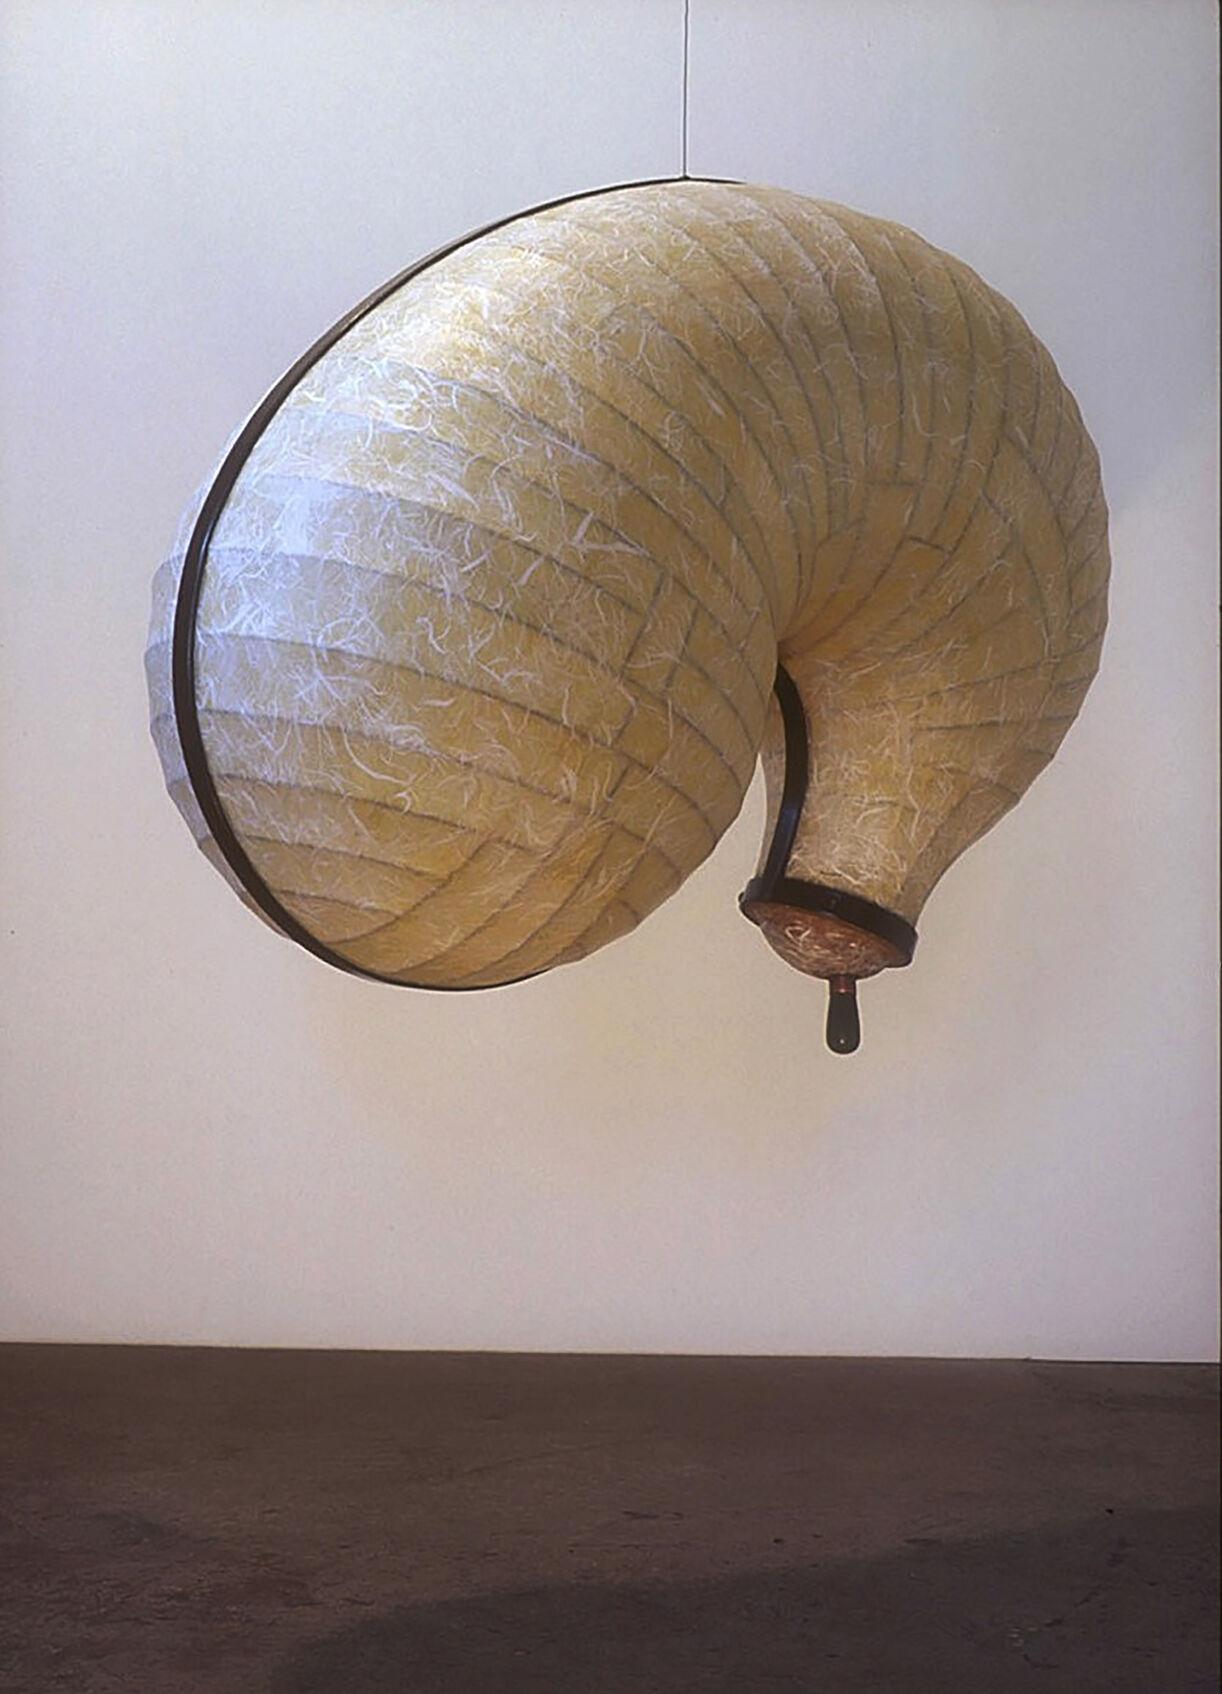 Copy of A. John Hughes. No Title. 1996. 27 x 37 x 24 inches. Steel, Paper, Nylon, Felt, Maple, Copper, Acrylic Polymer.jpeg